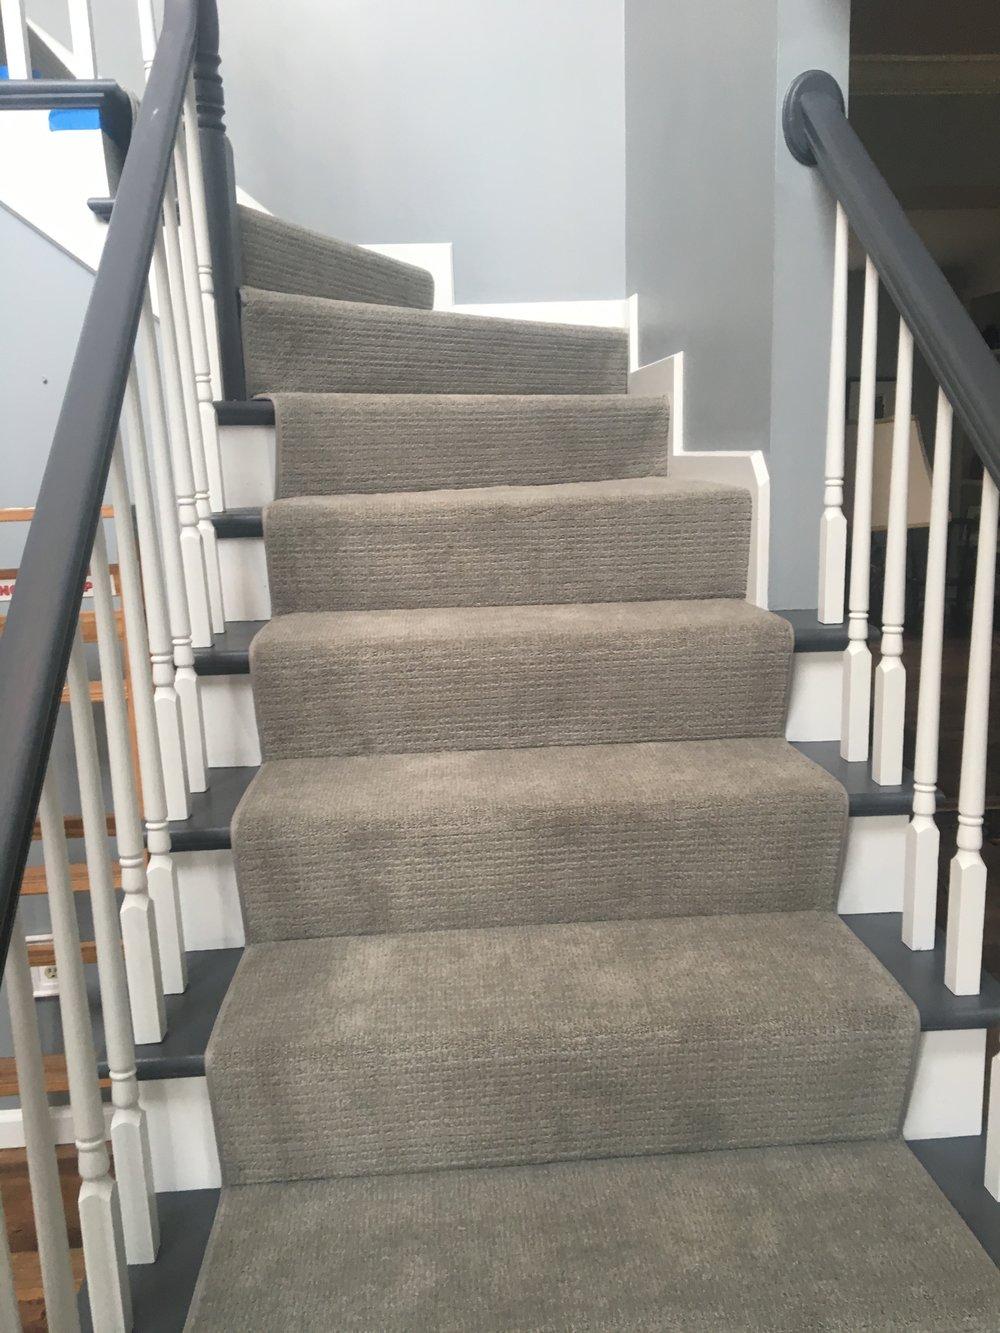 nitzsche stair.JPG